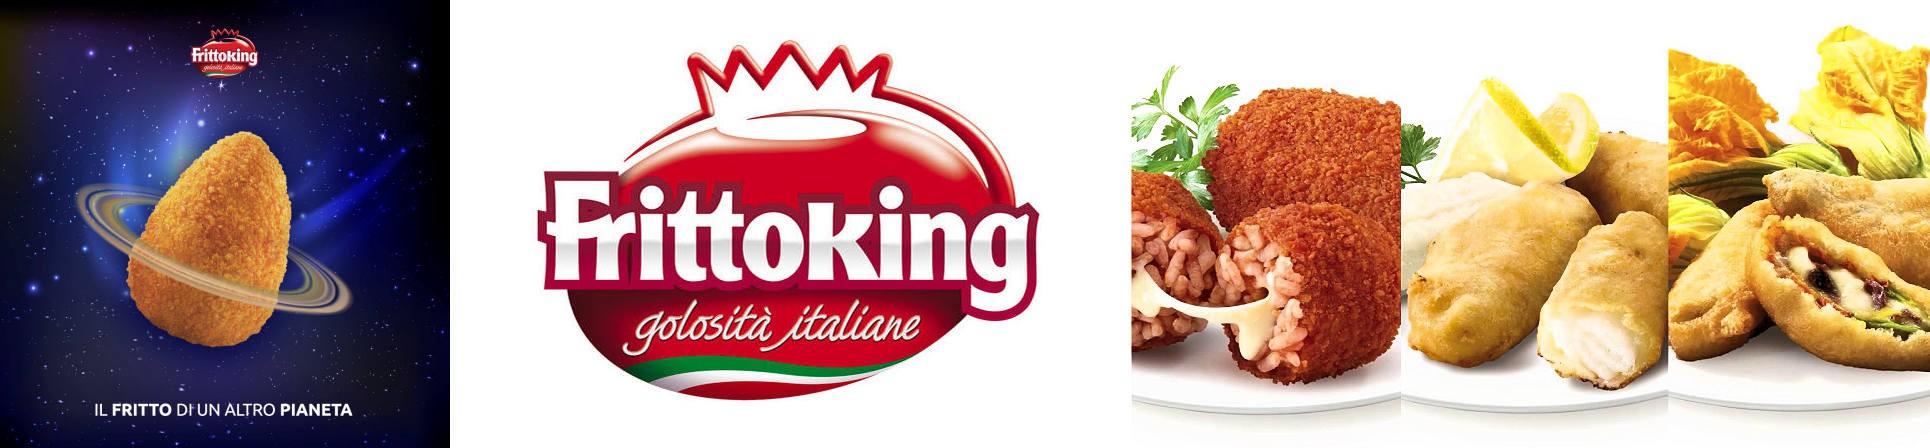 B2B GUSTOX - il Marketplace all'ingrosso delle eccellenze agroalimentari italiane - FRITTOKING